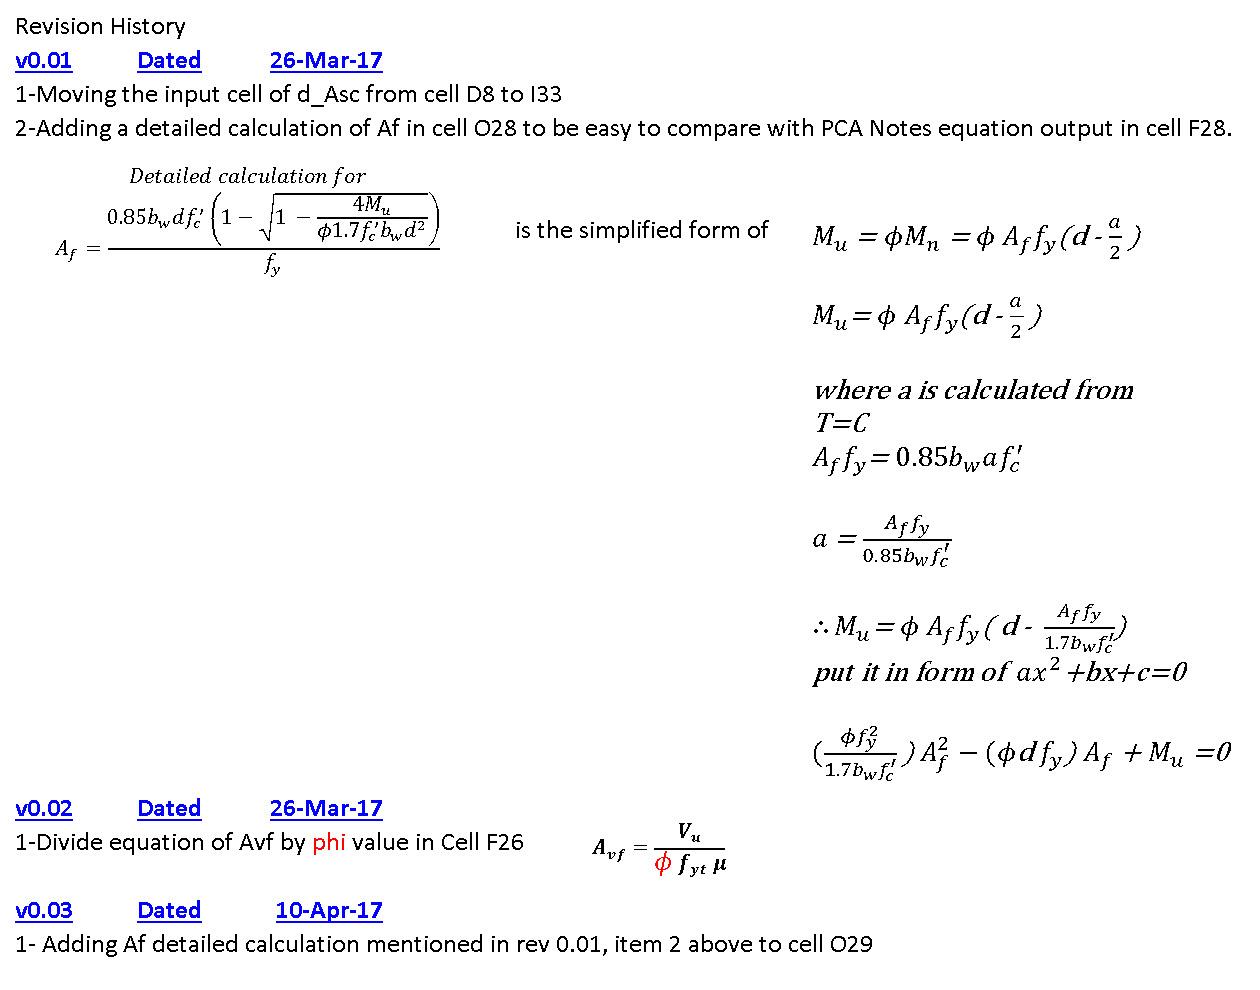 Mohamed Abushady, P.E.: ACI 318M-11 RC Bracket and Corbel Design